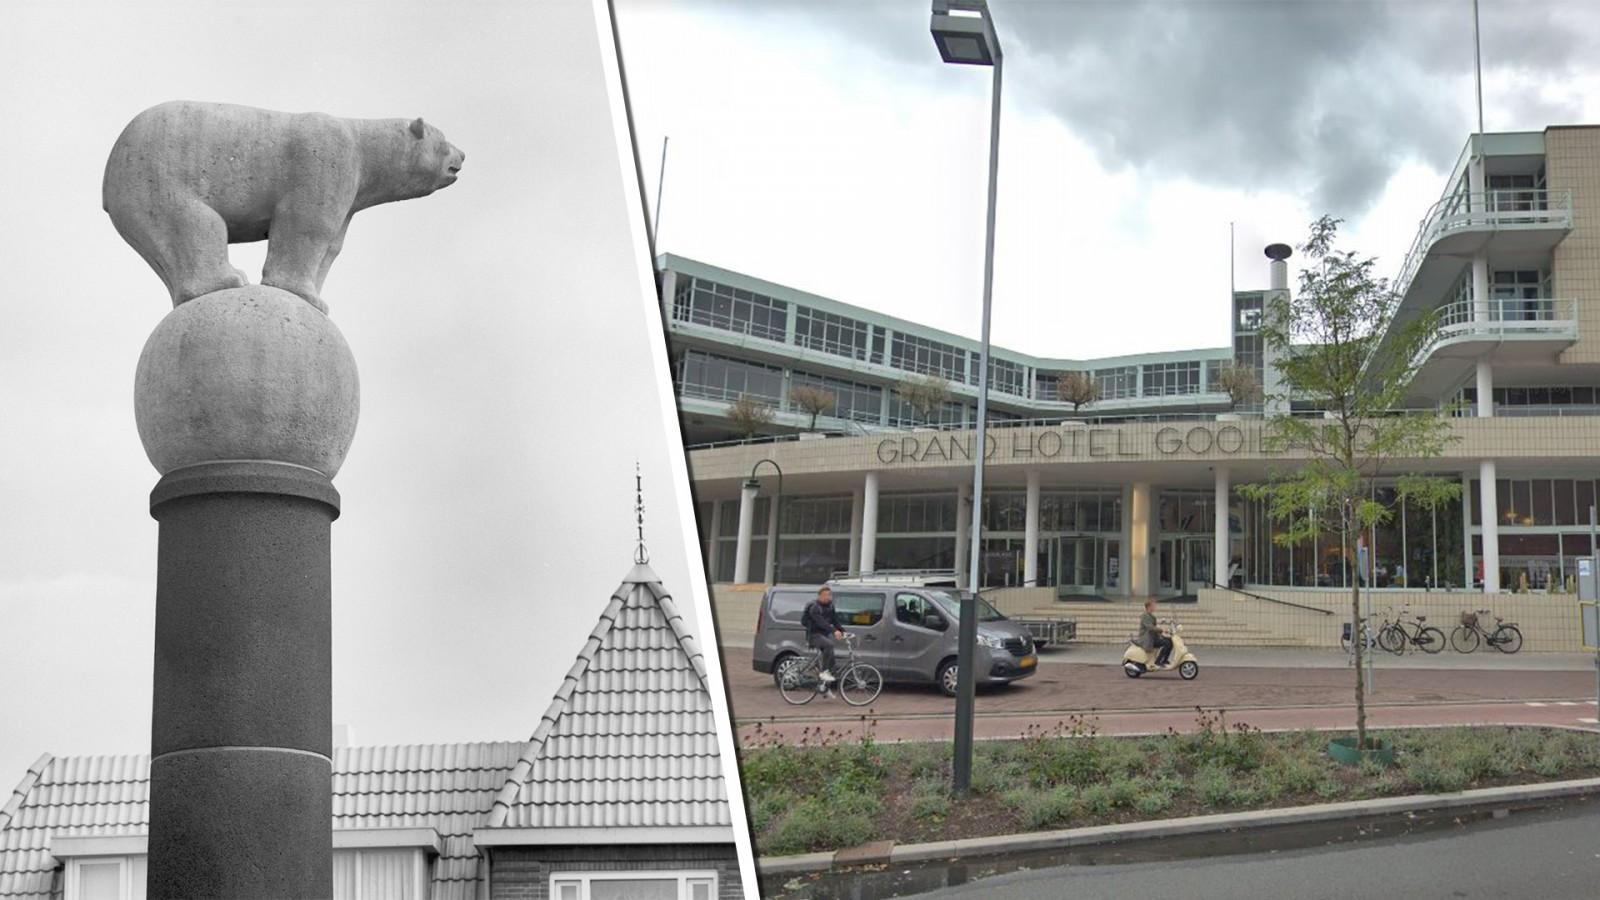 Straks LIVE: Hilversum viert de bevrijding met onthulling monument